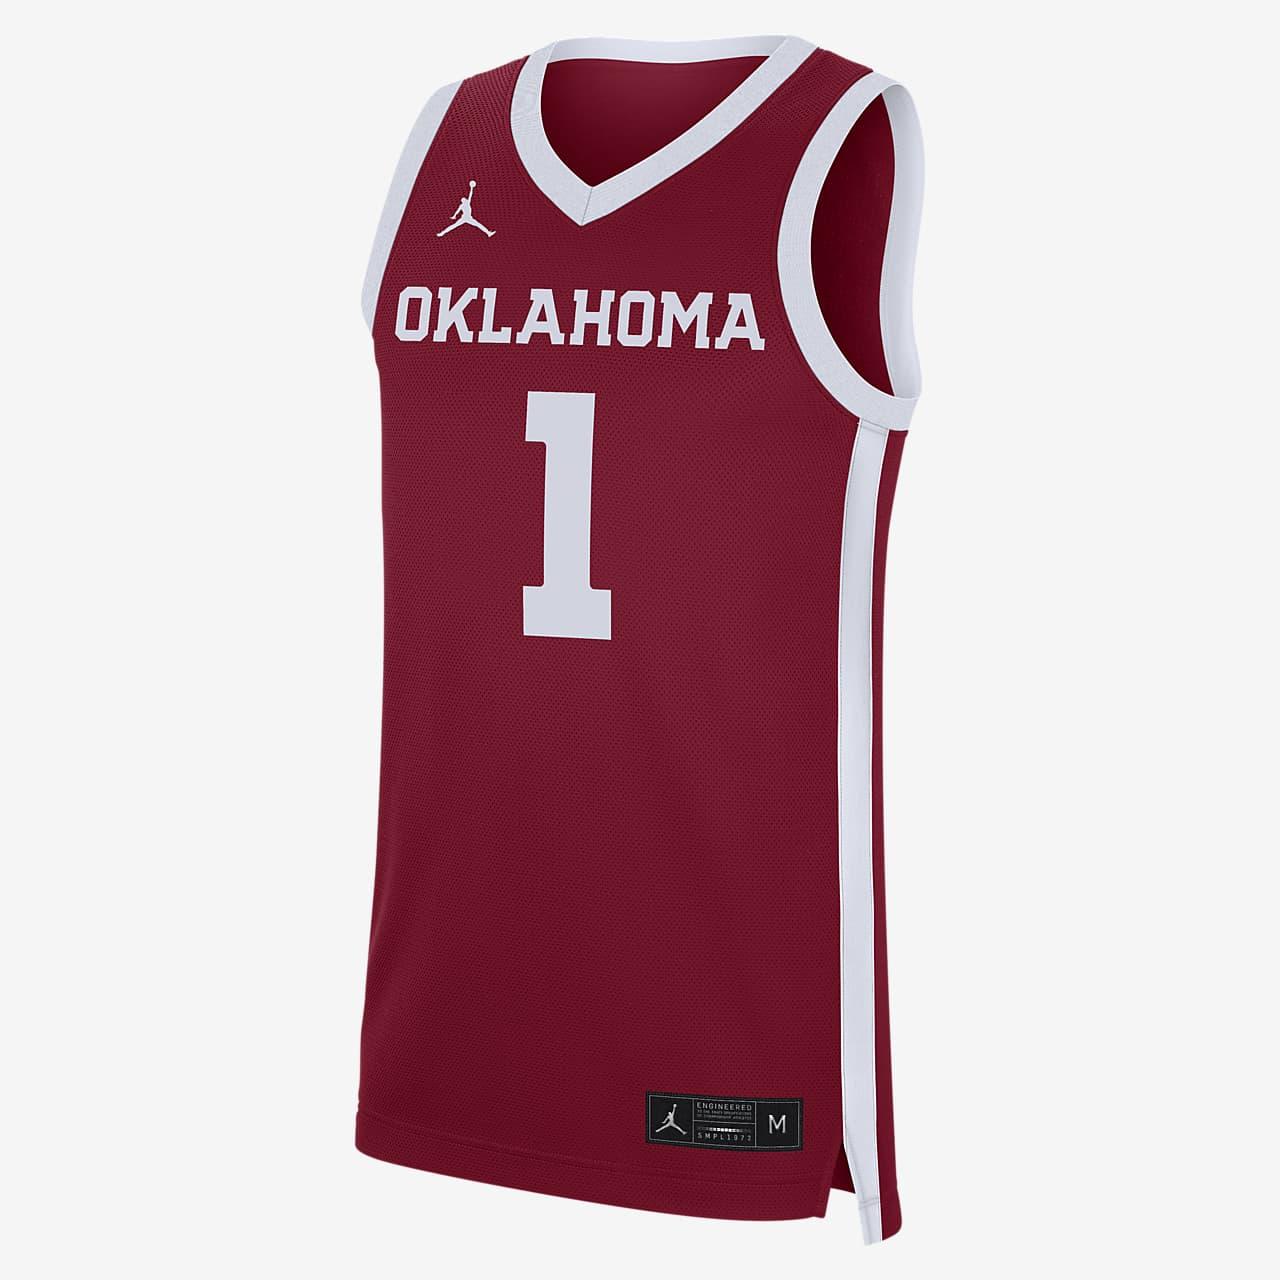 Nike College Replica (Oklahoma) Men's Basketball Jersey